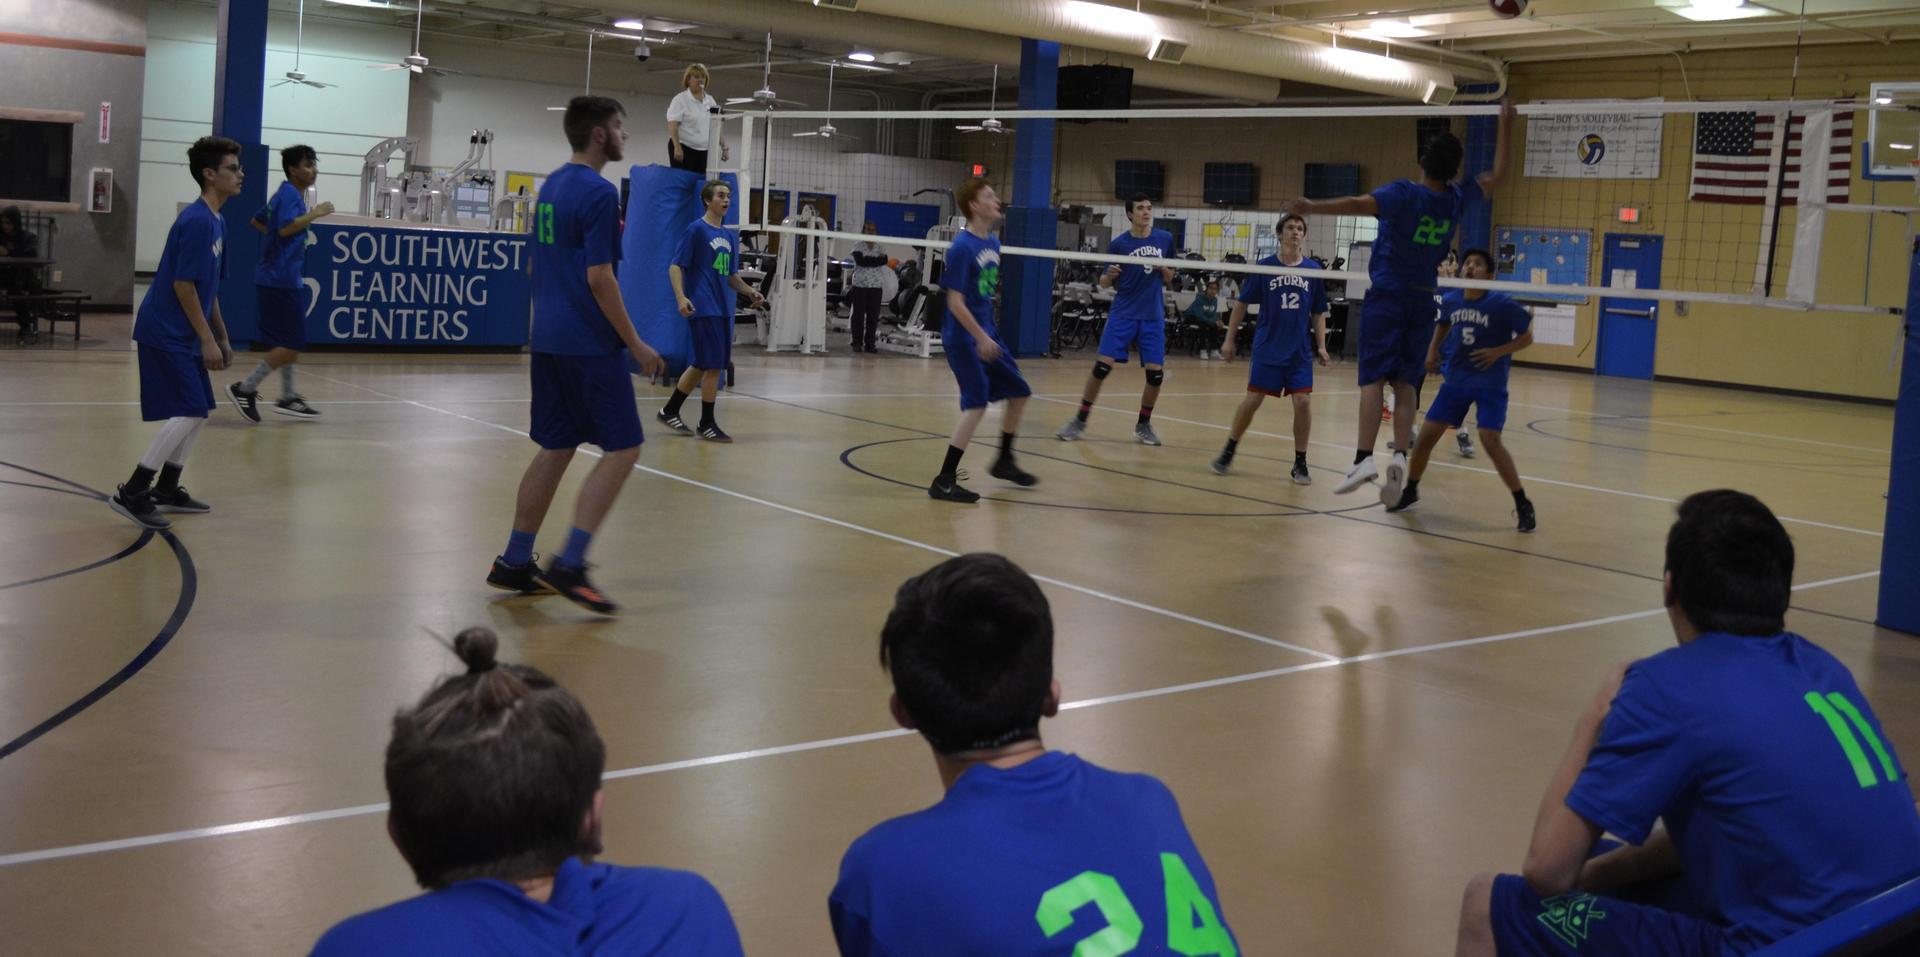 High School Boys Volleyball Game